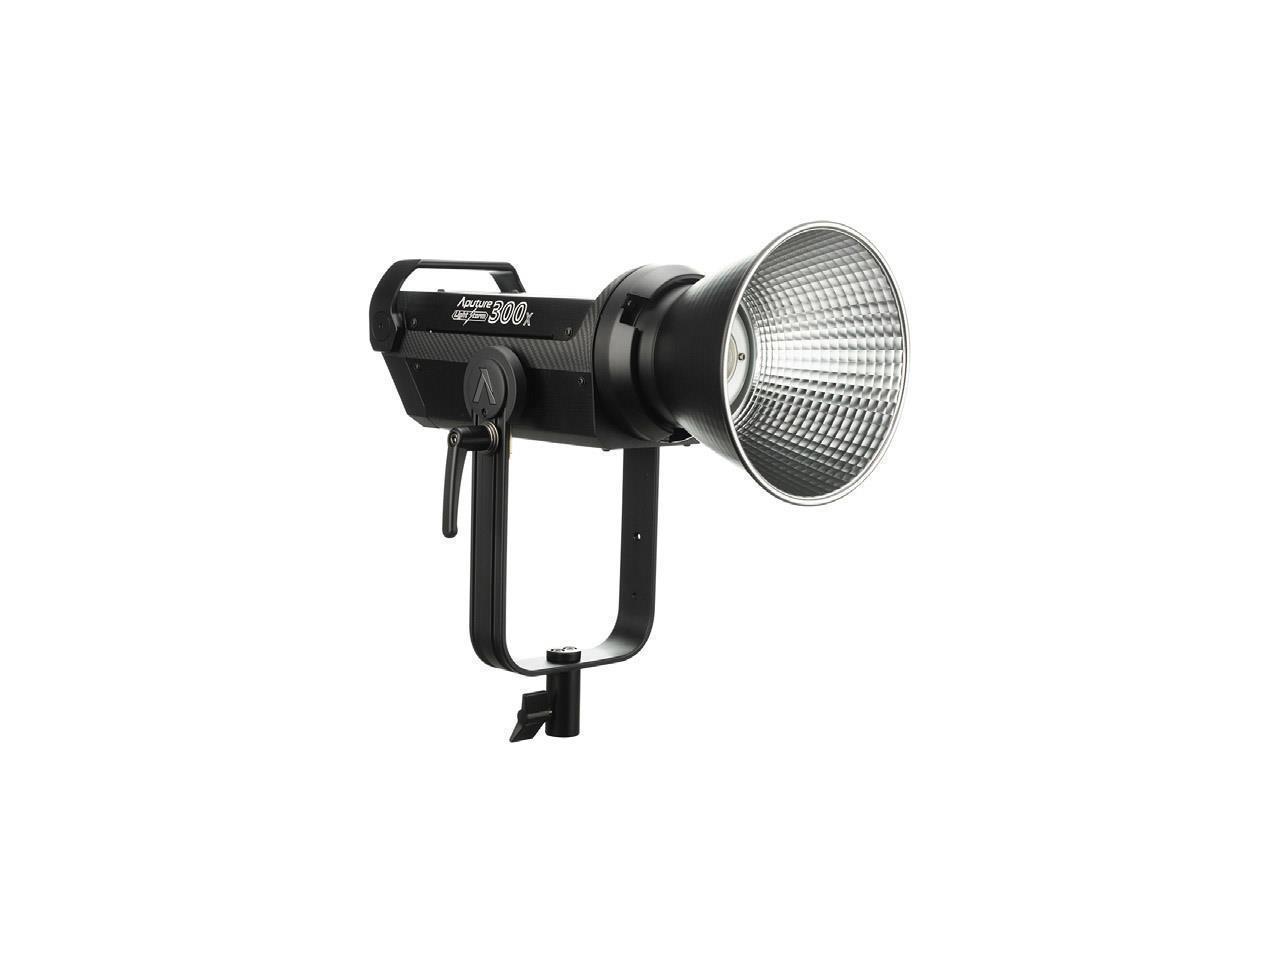 Camera & Photo Electronics alpha-grp.co.jp Aputure Light Storm ...